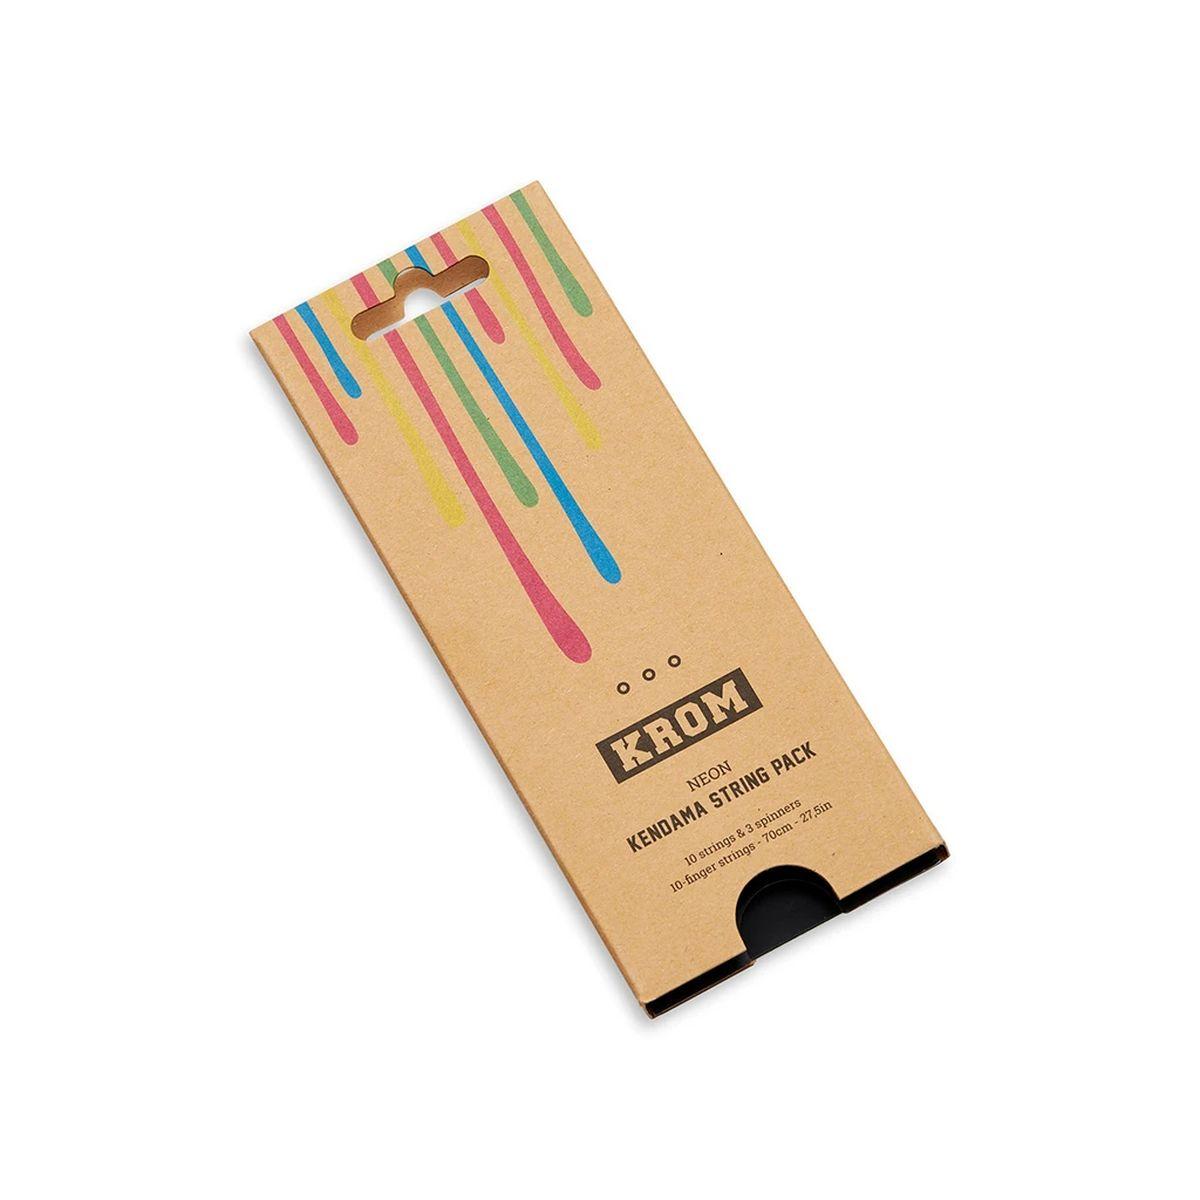 Zestaw Krom String Pack Neon